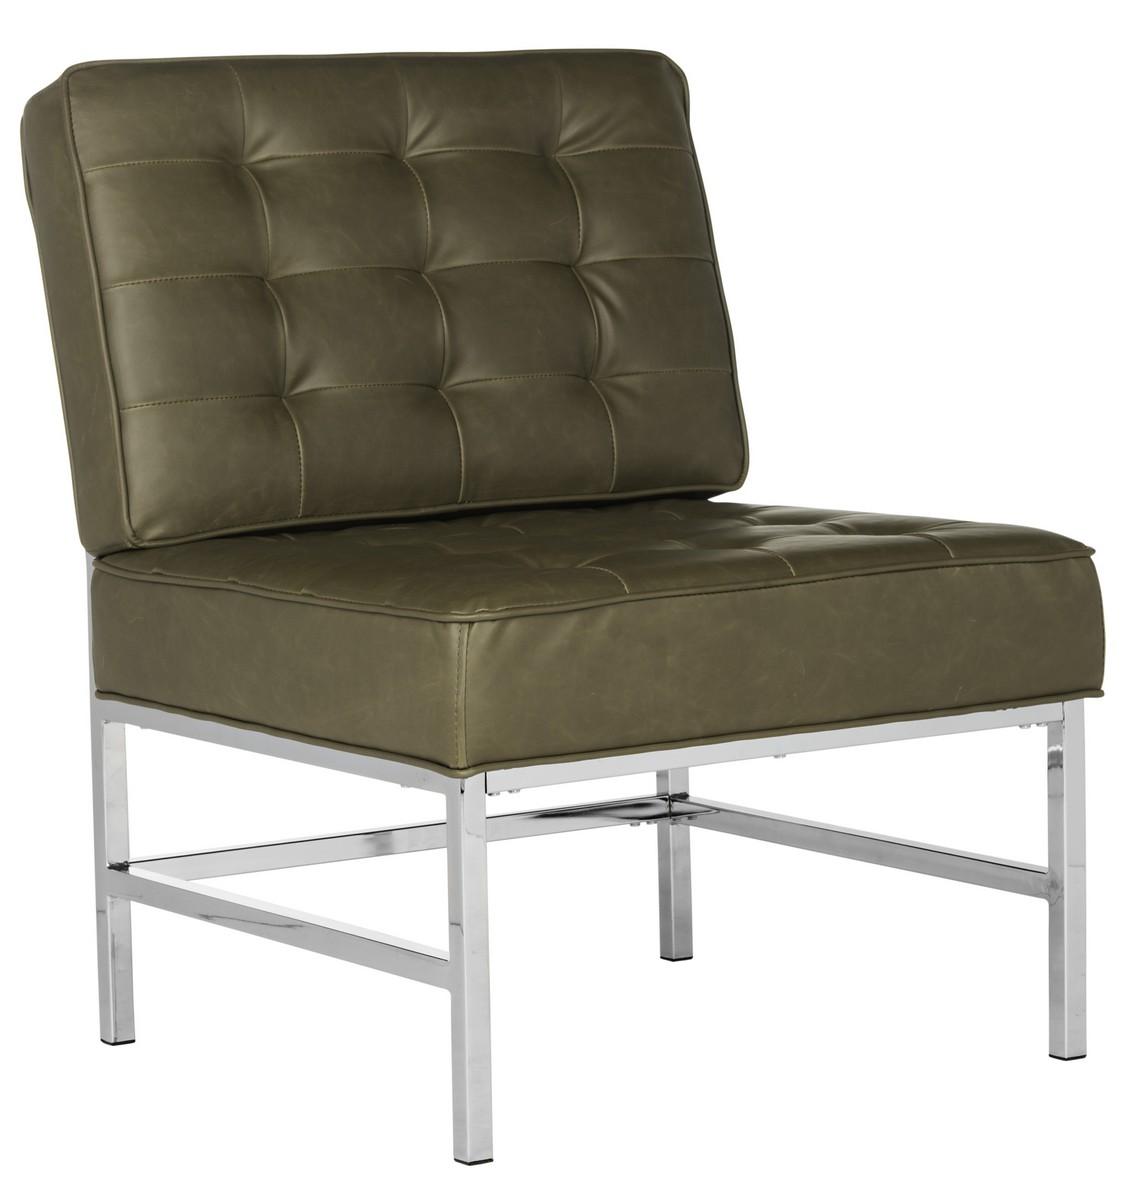 FOX6268A Accent Chairs - Furniture by Safavieh  Safavieh